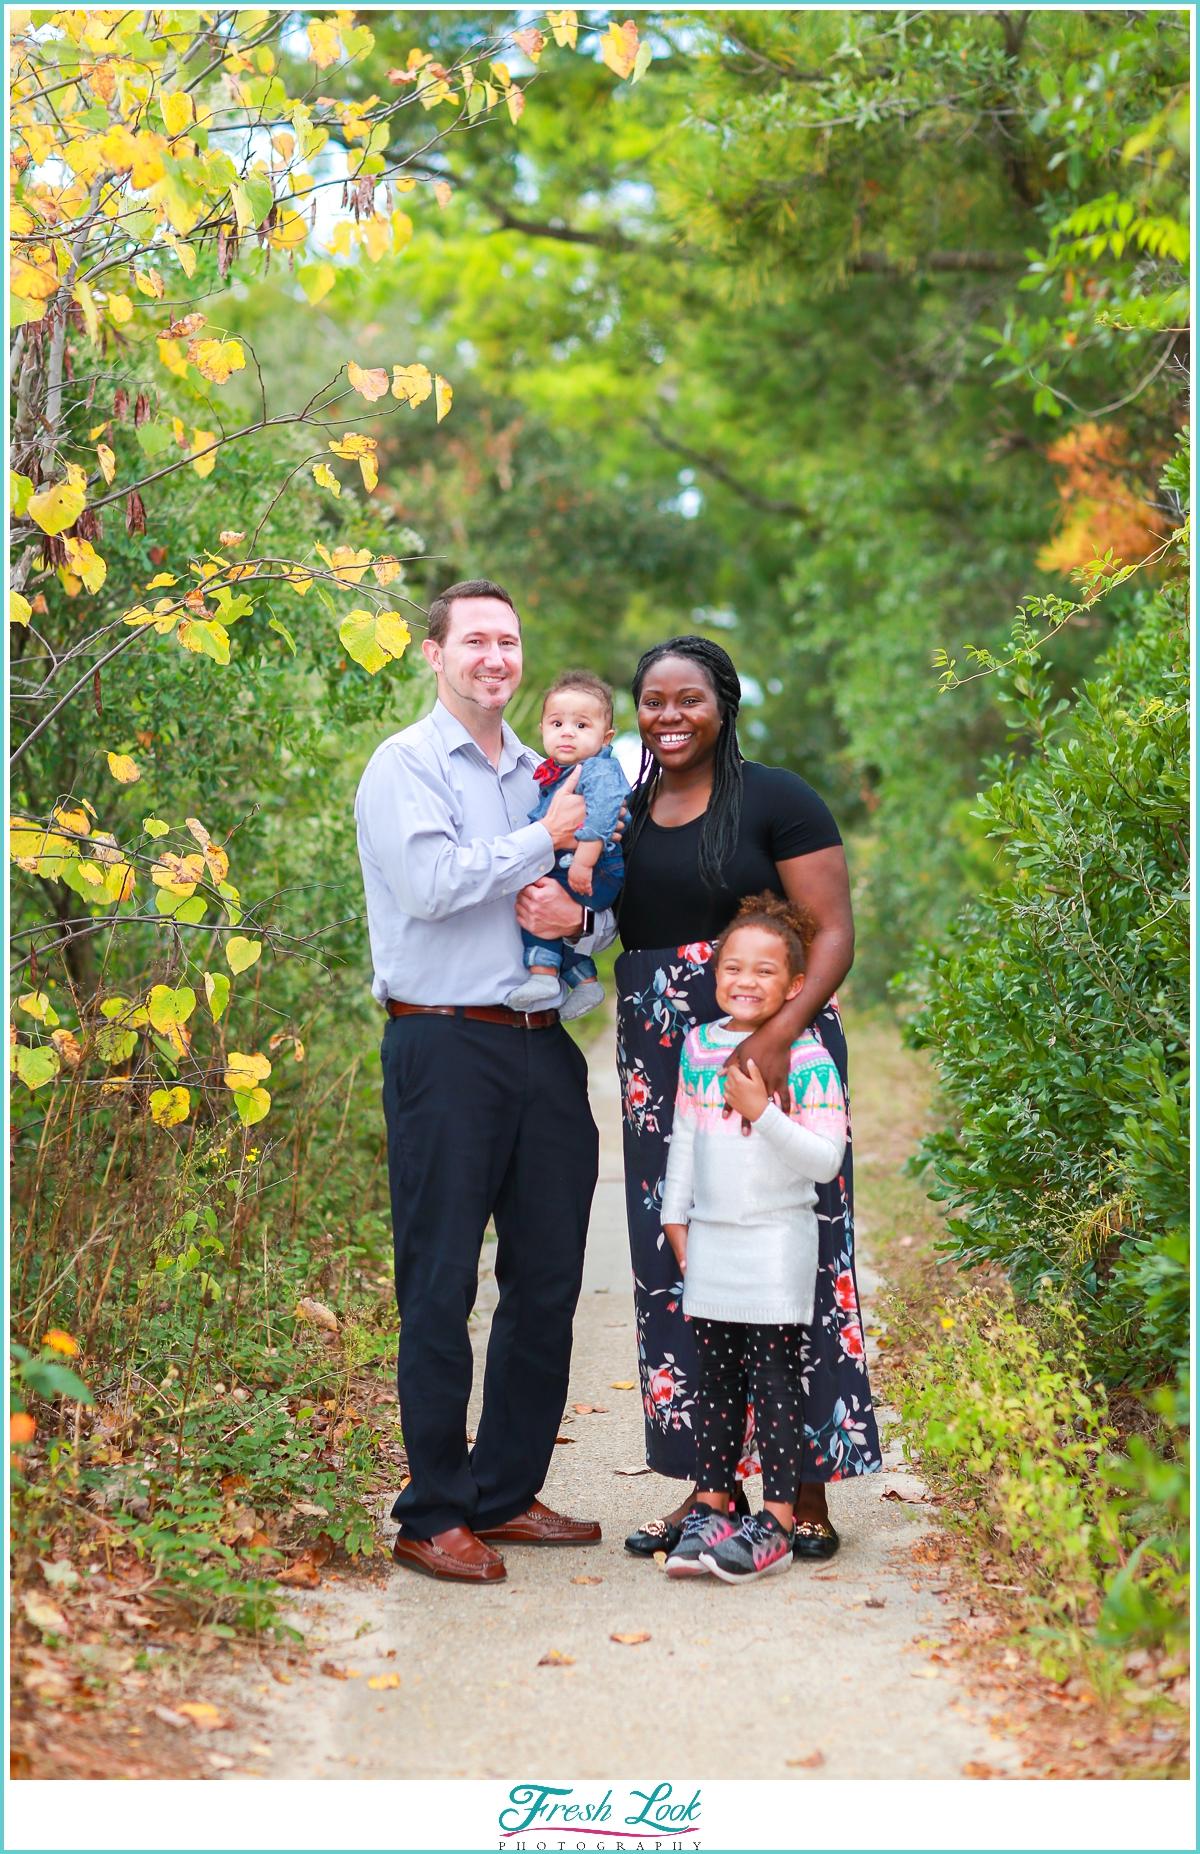 Woodsy family photos